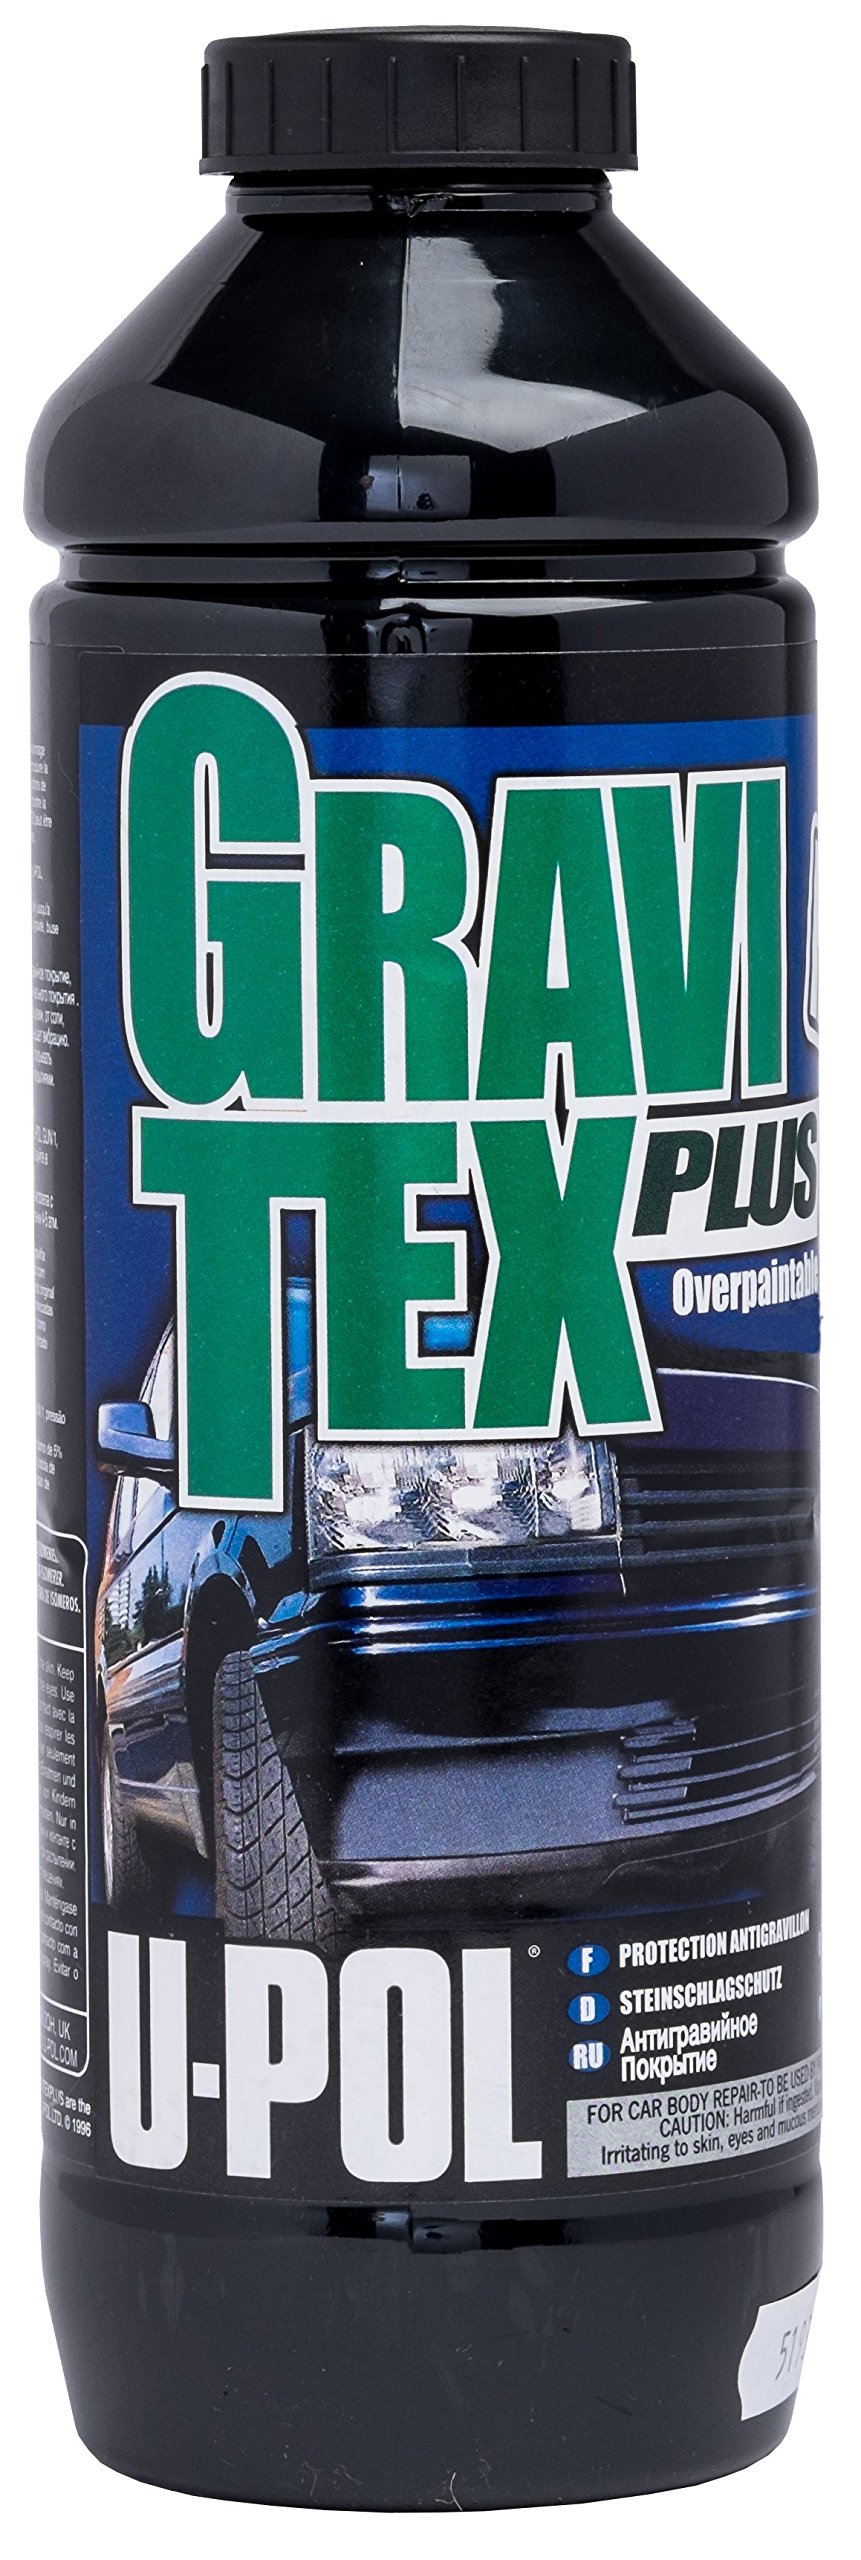 U-Pol Products 0721 Black GRAVITEX Plus HS Stone Chip Protector - 1 Liter